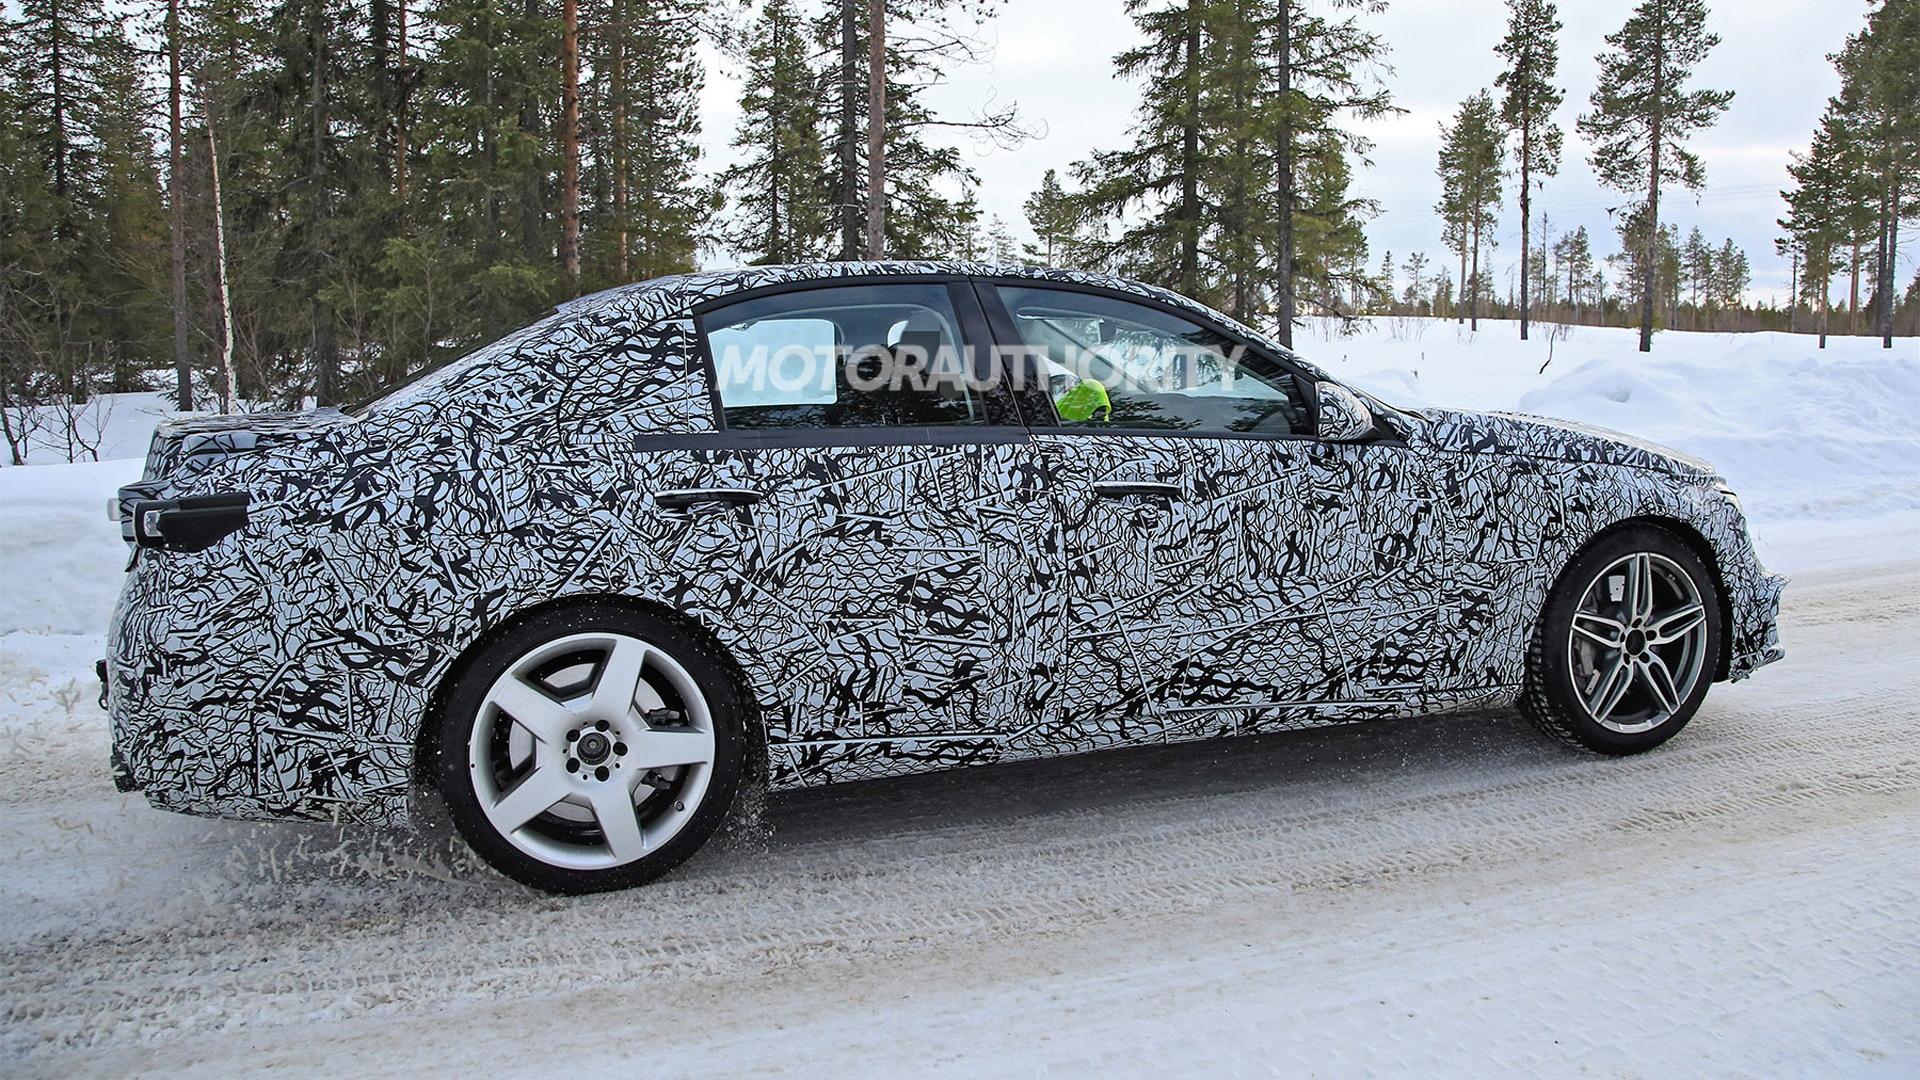 2022 Mercedes-AMG C53 spy shots - Photo credit: S. Baldauf/SB-Medien